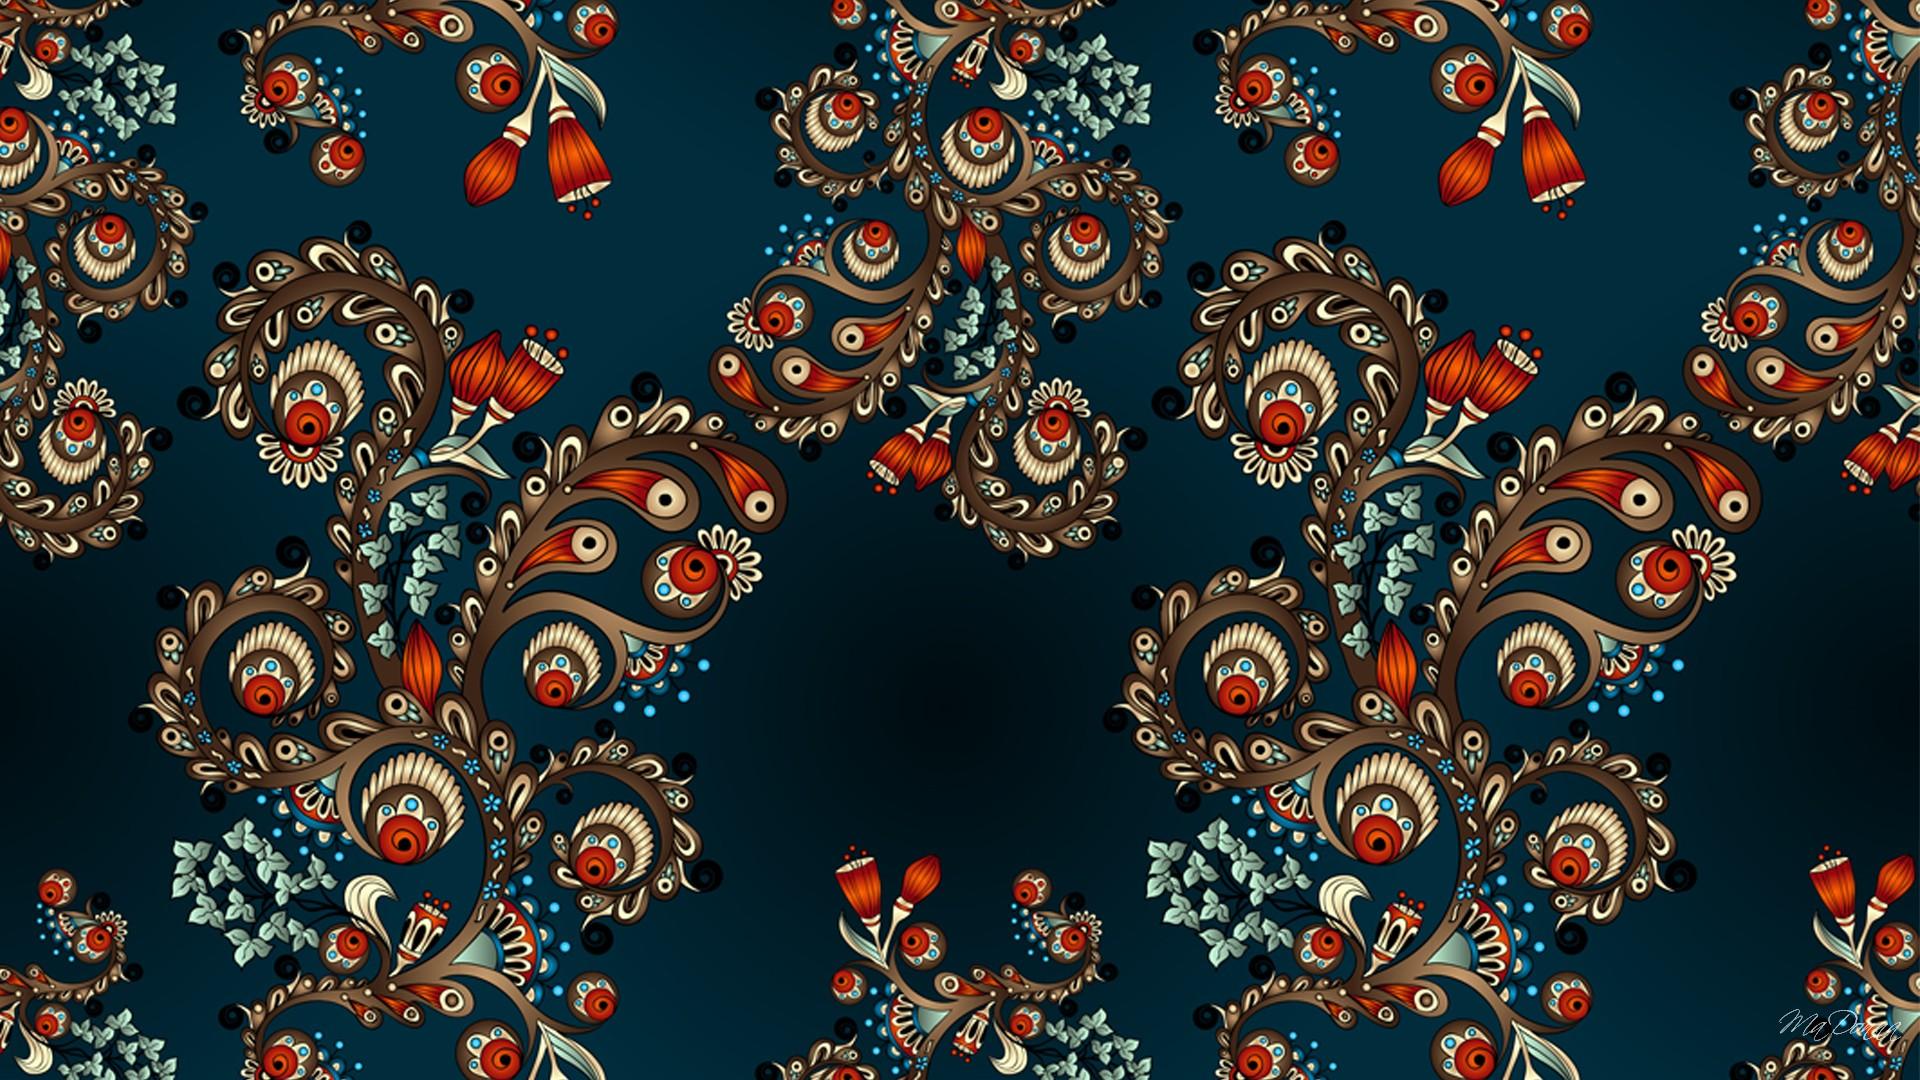 abstract paisley desktop wallpaper 61423